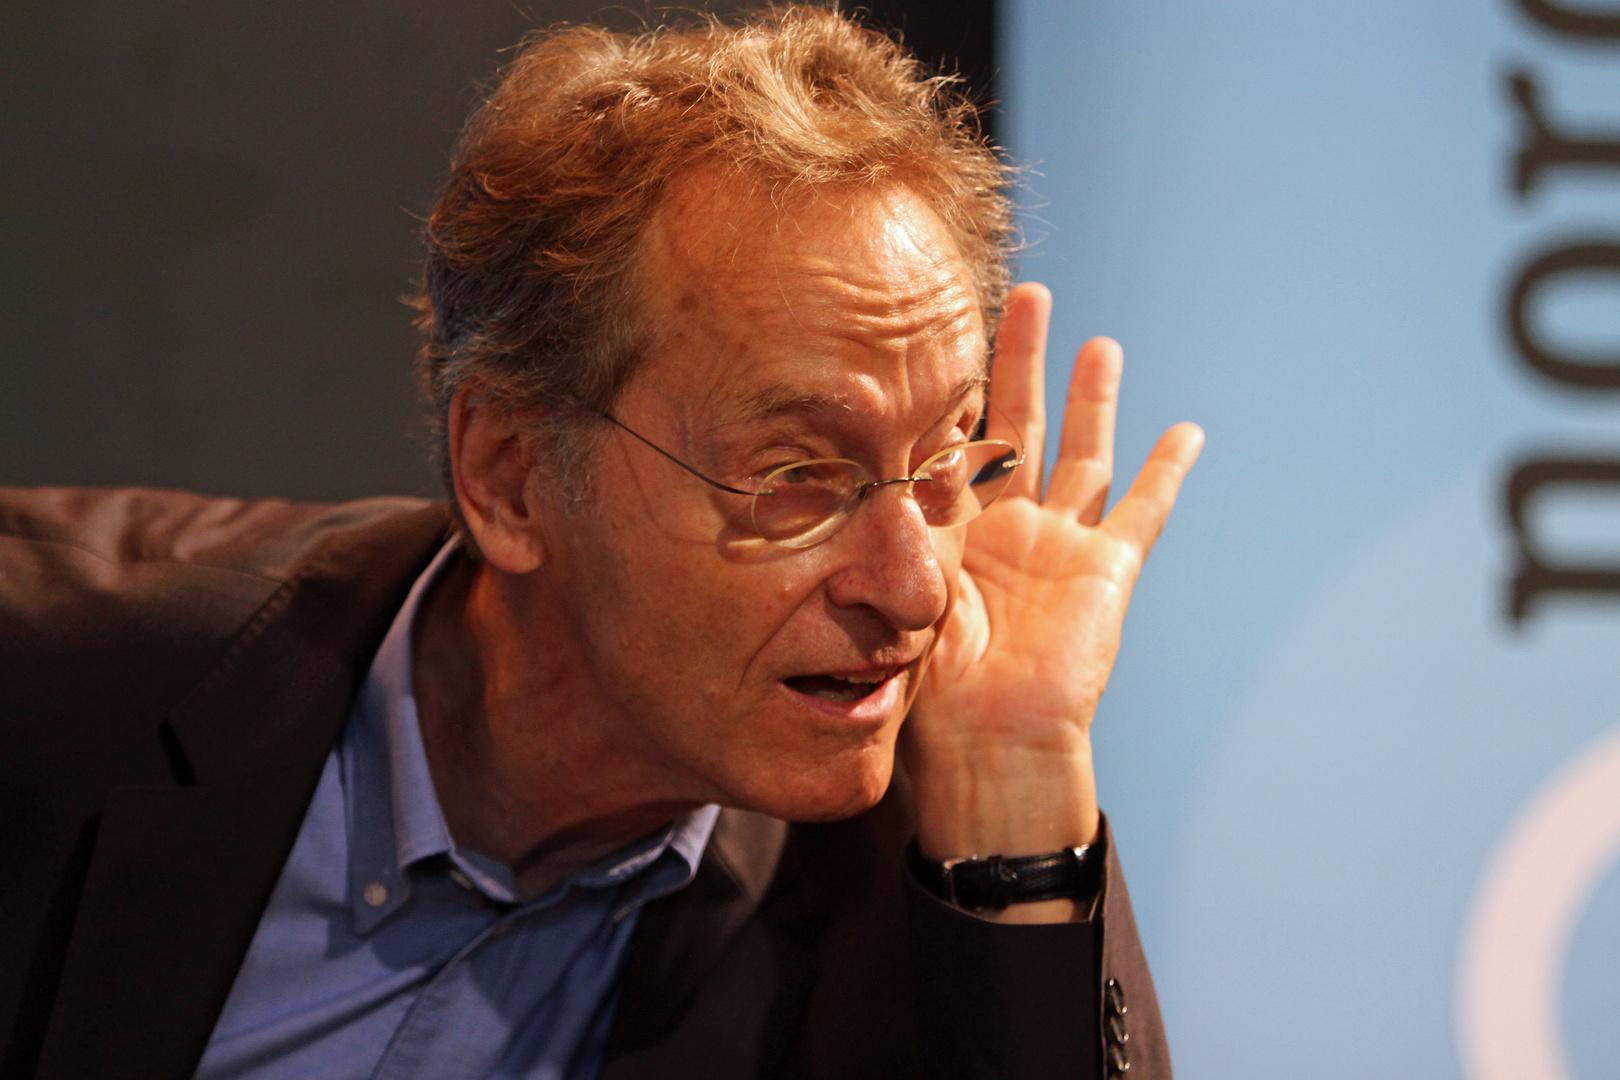 Schriftsteller Bernhard Schlink als Zuhörer :-)